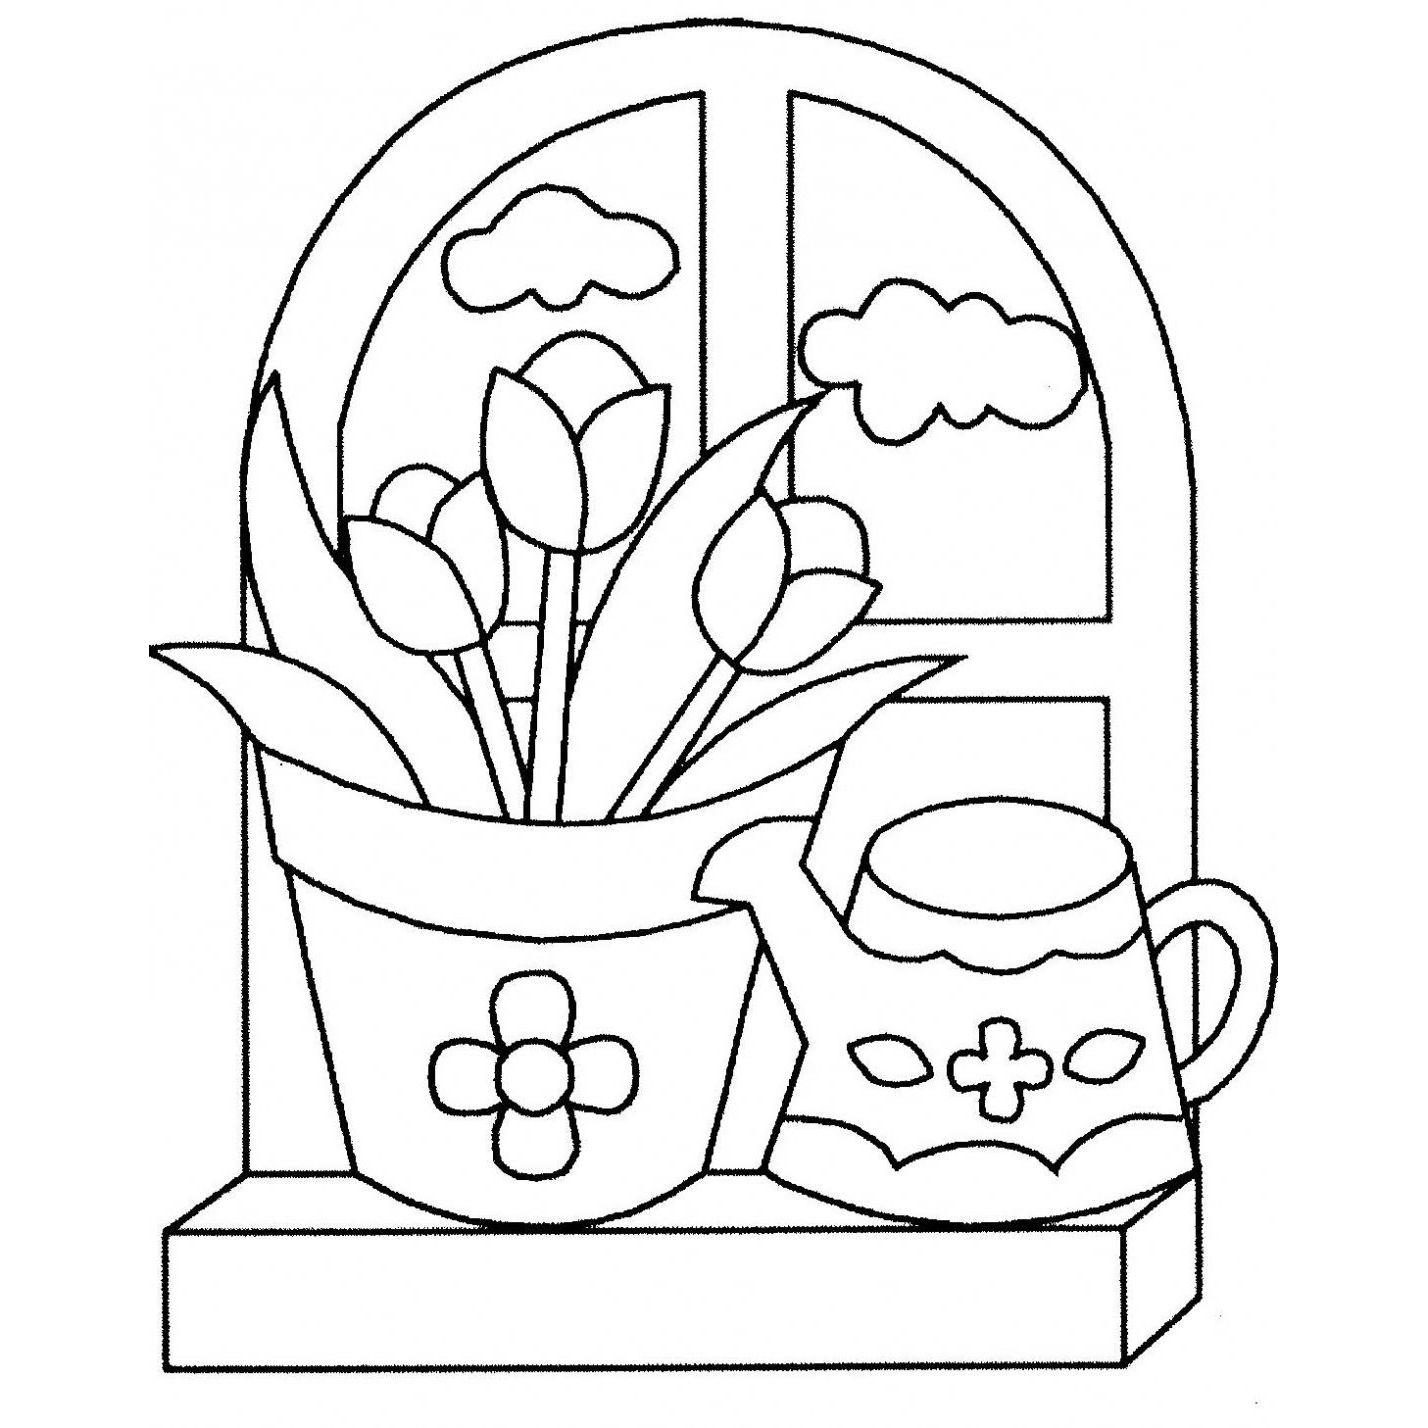 Plantillas de flores para pintar en tela flores - Plantillas para pintar ...